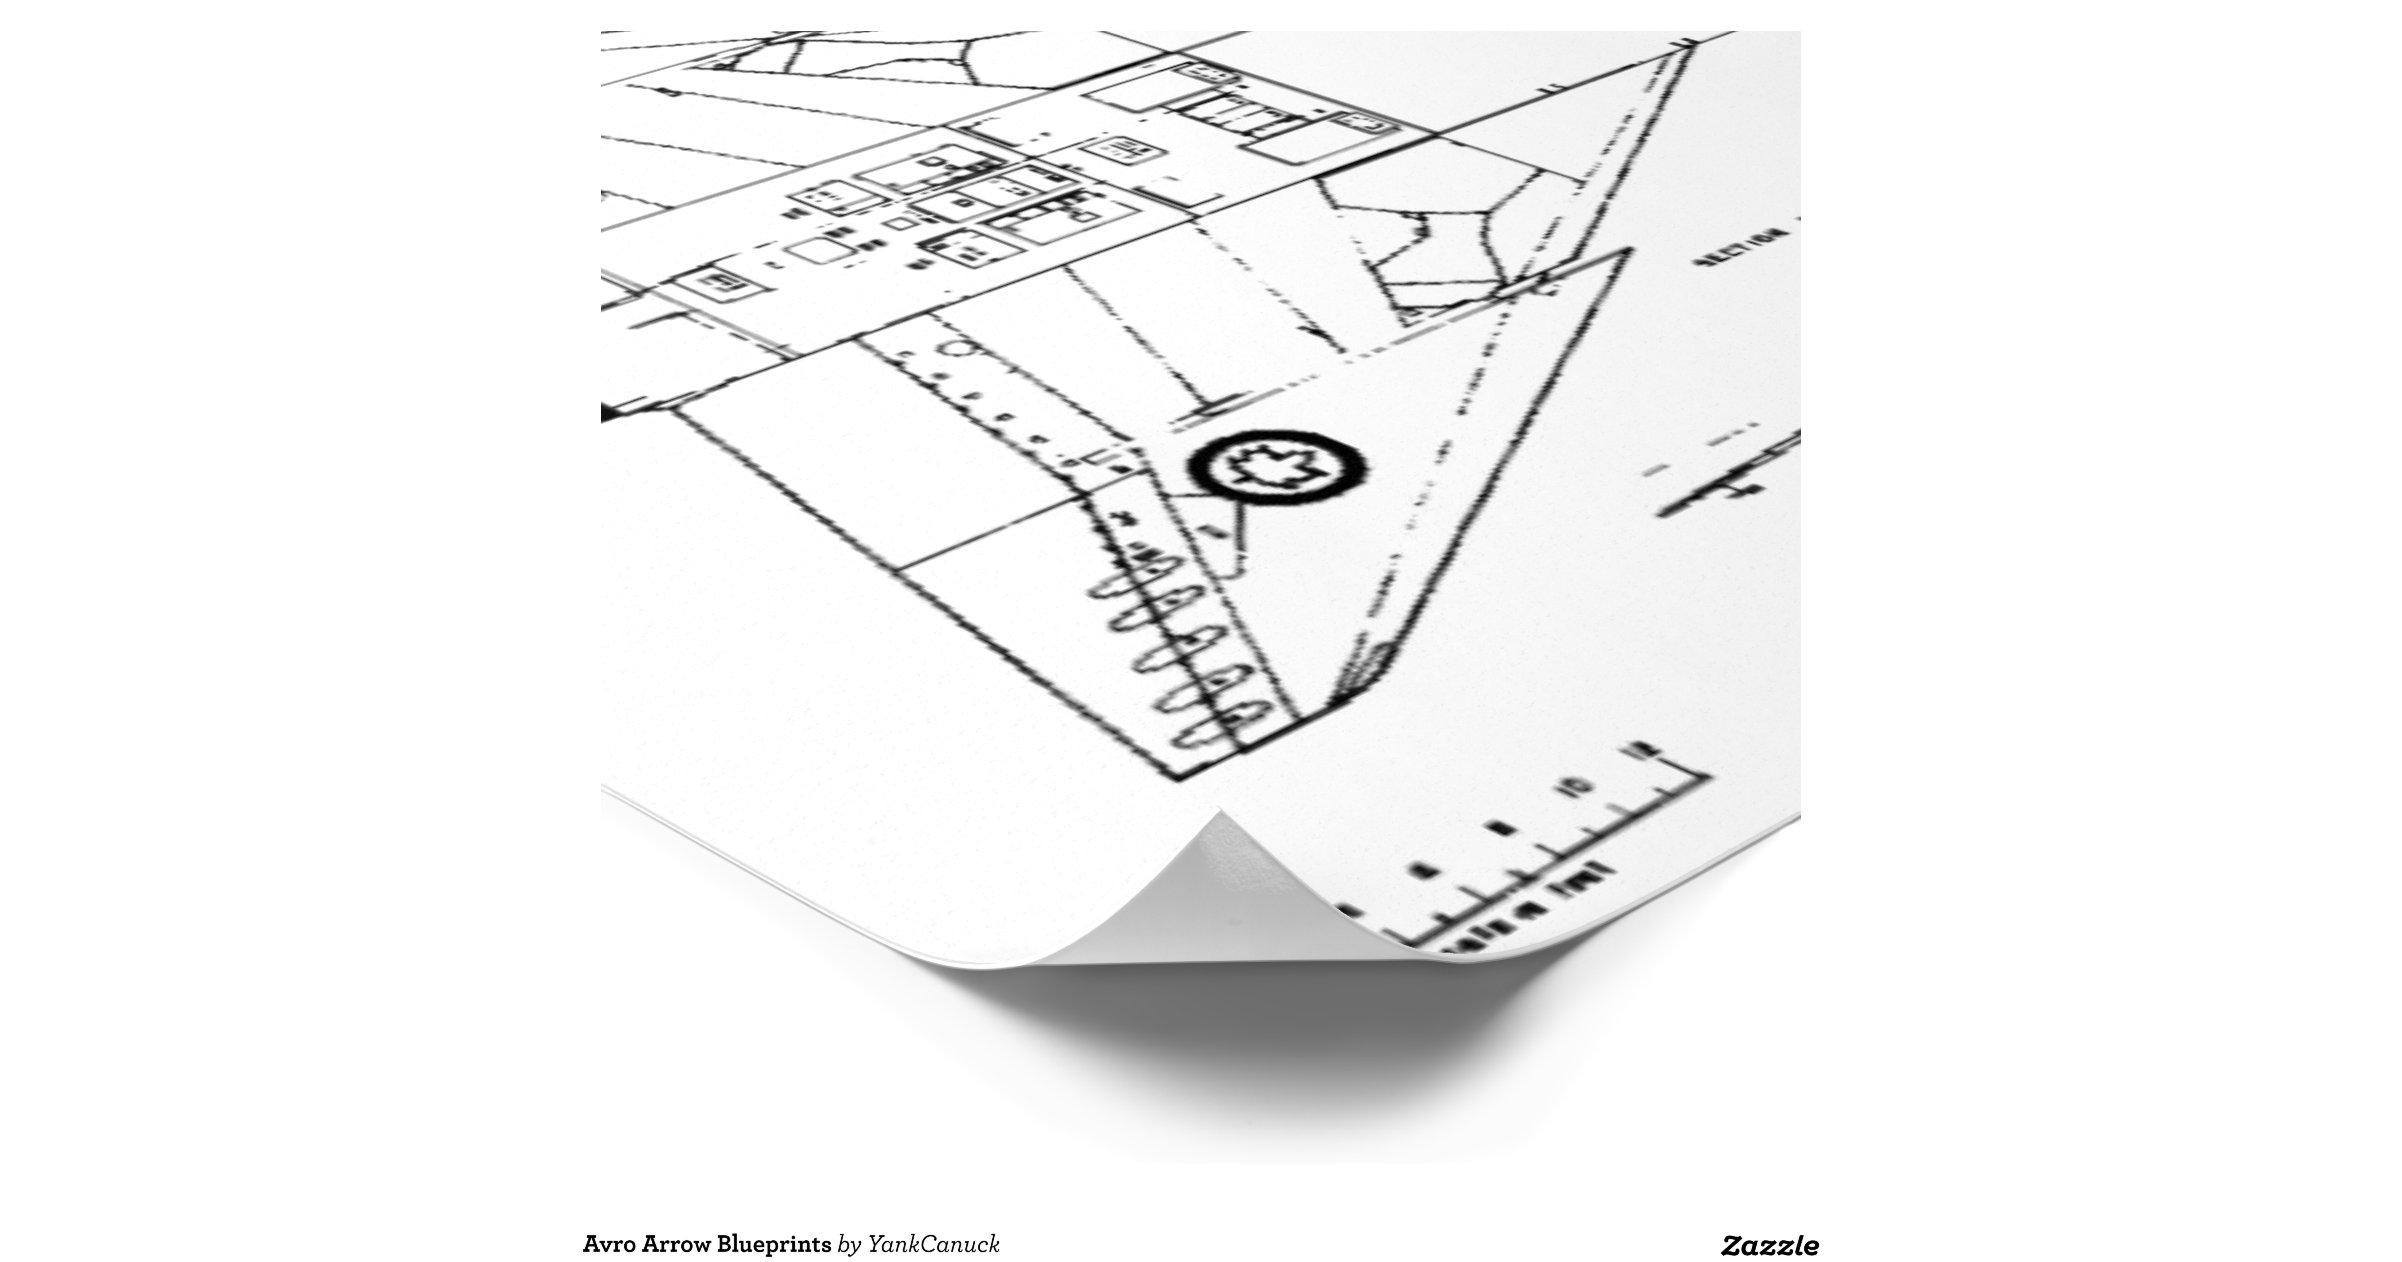 Avro Arrow Blueprints Poster | Zazzle